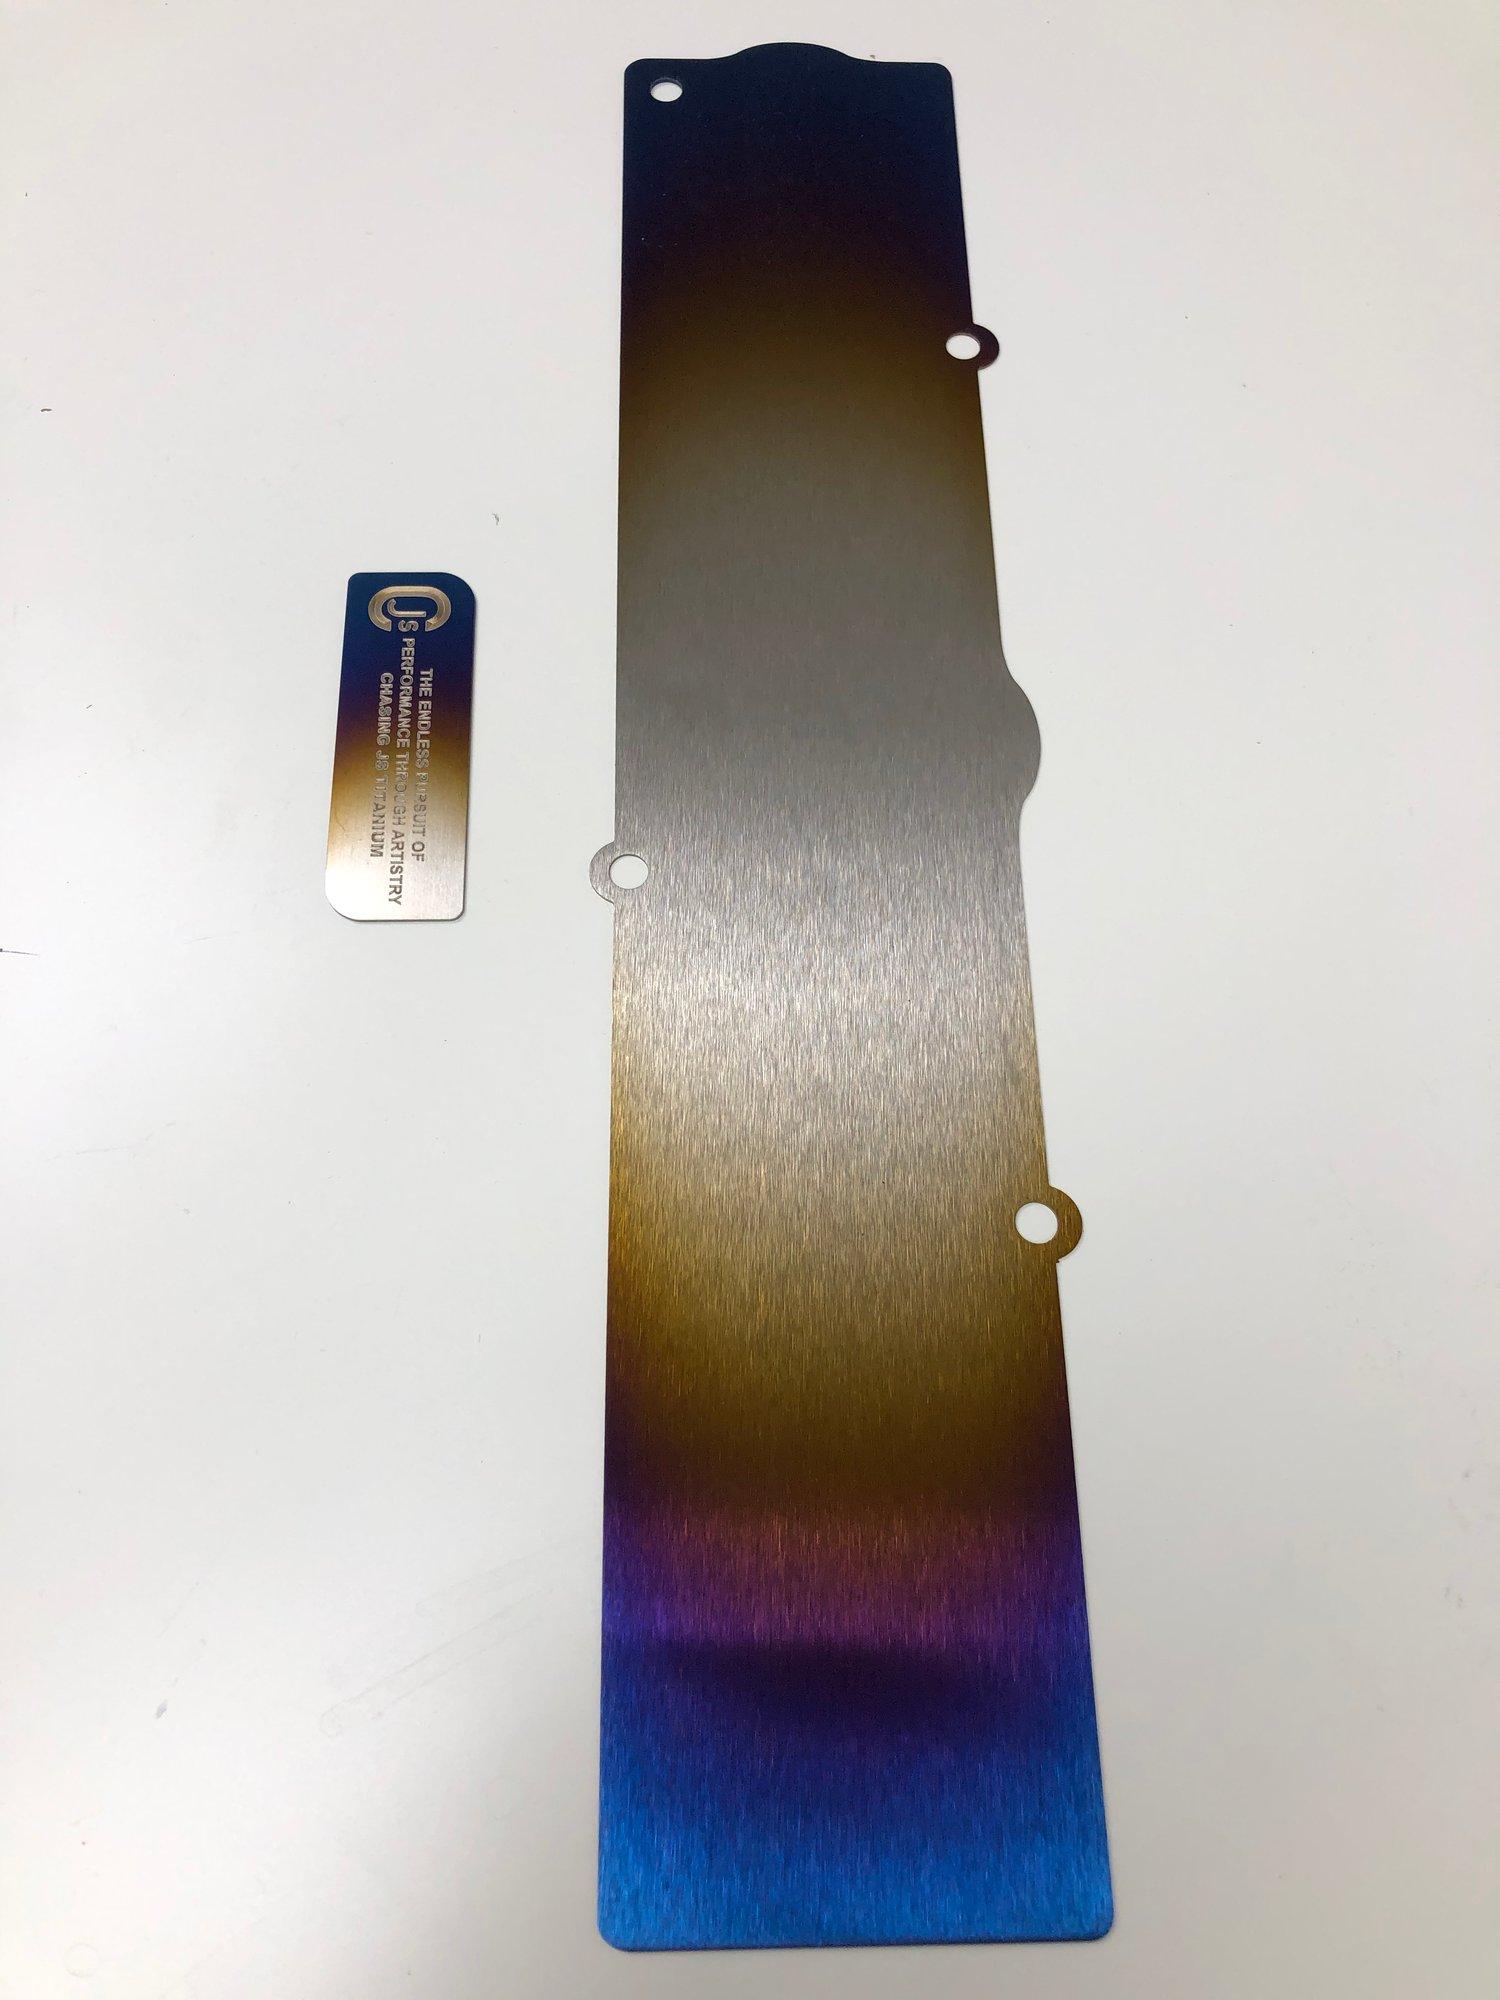 Image of Mitsubishi Evo X 10 Titanium coil pack cover.